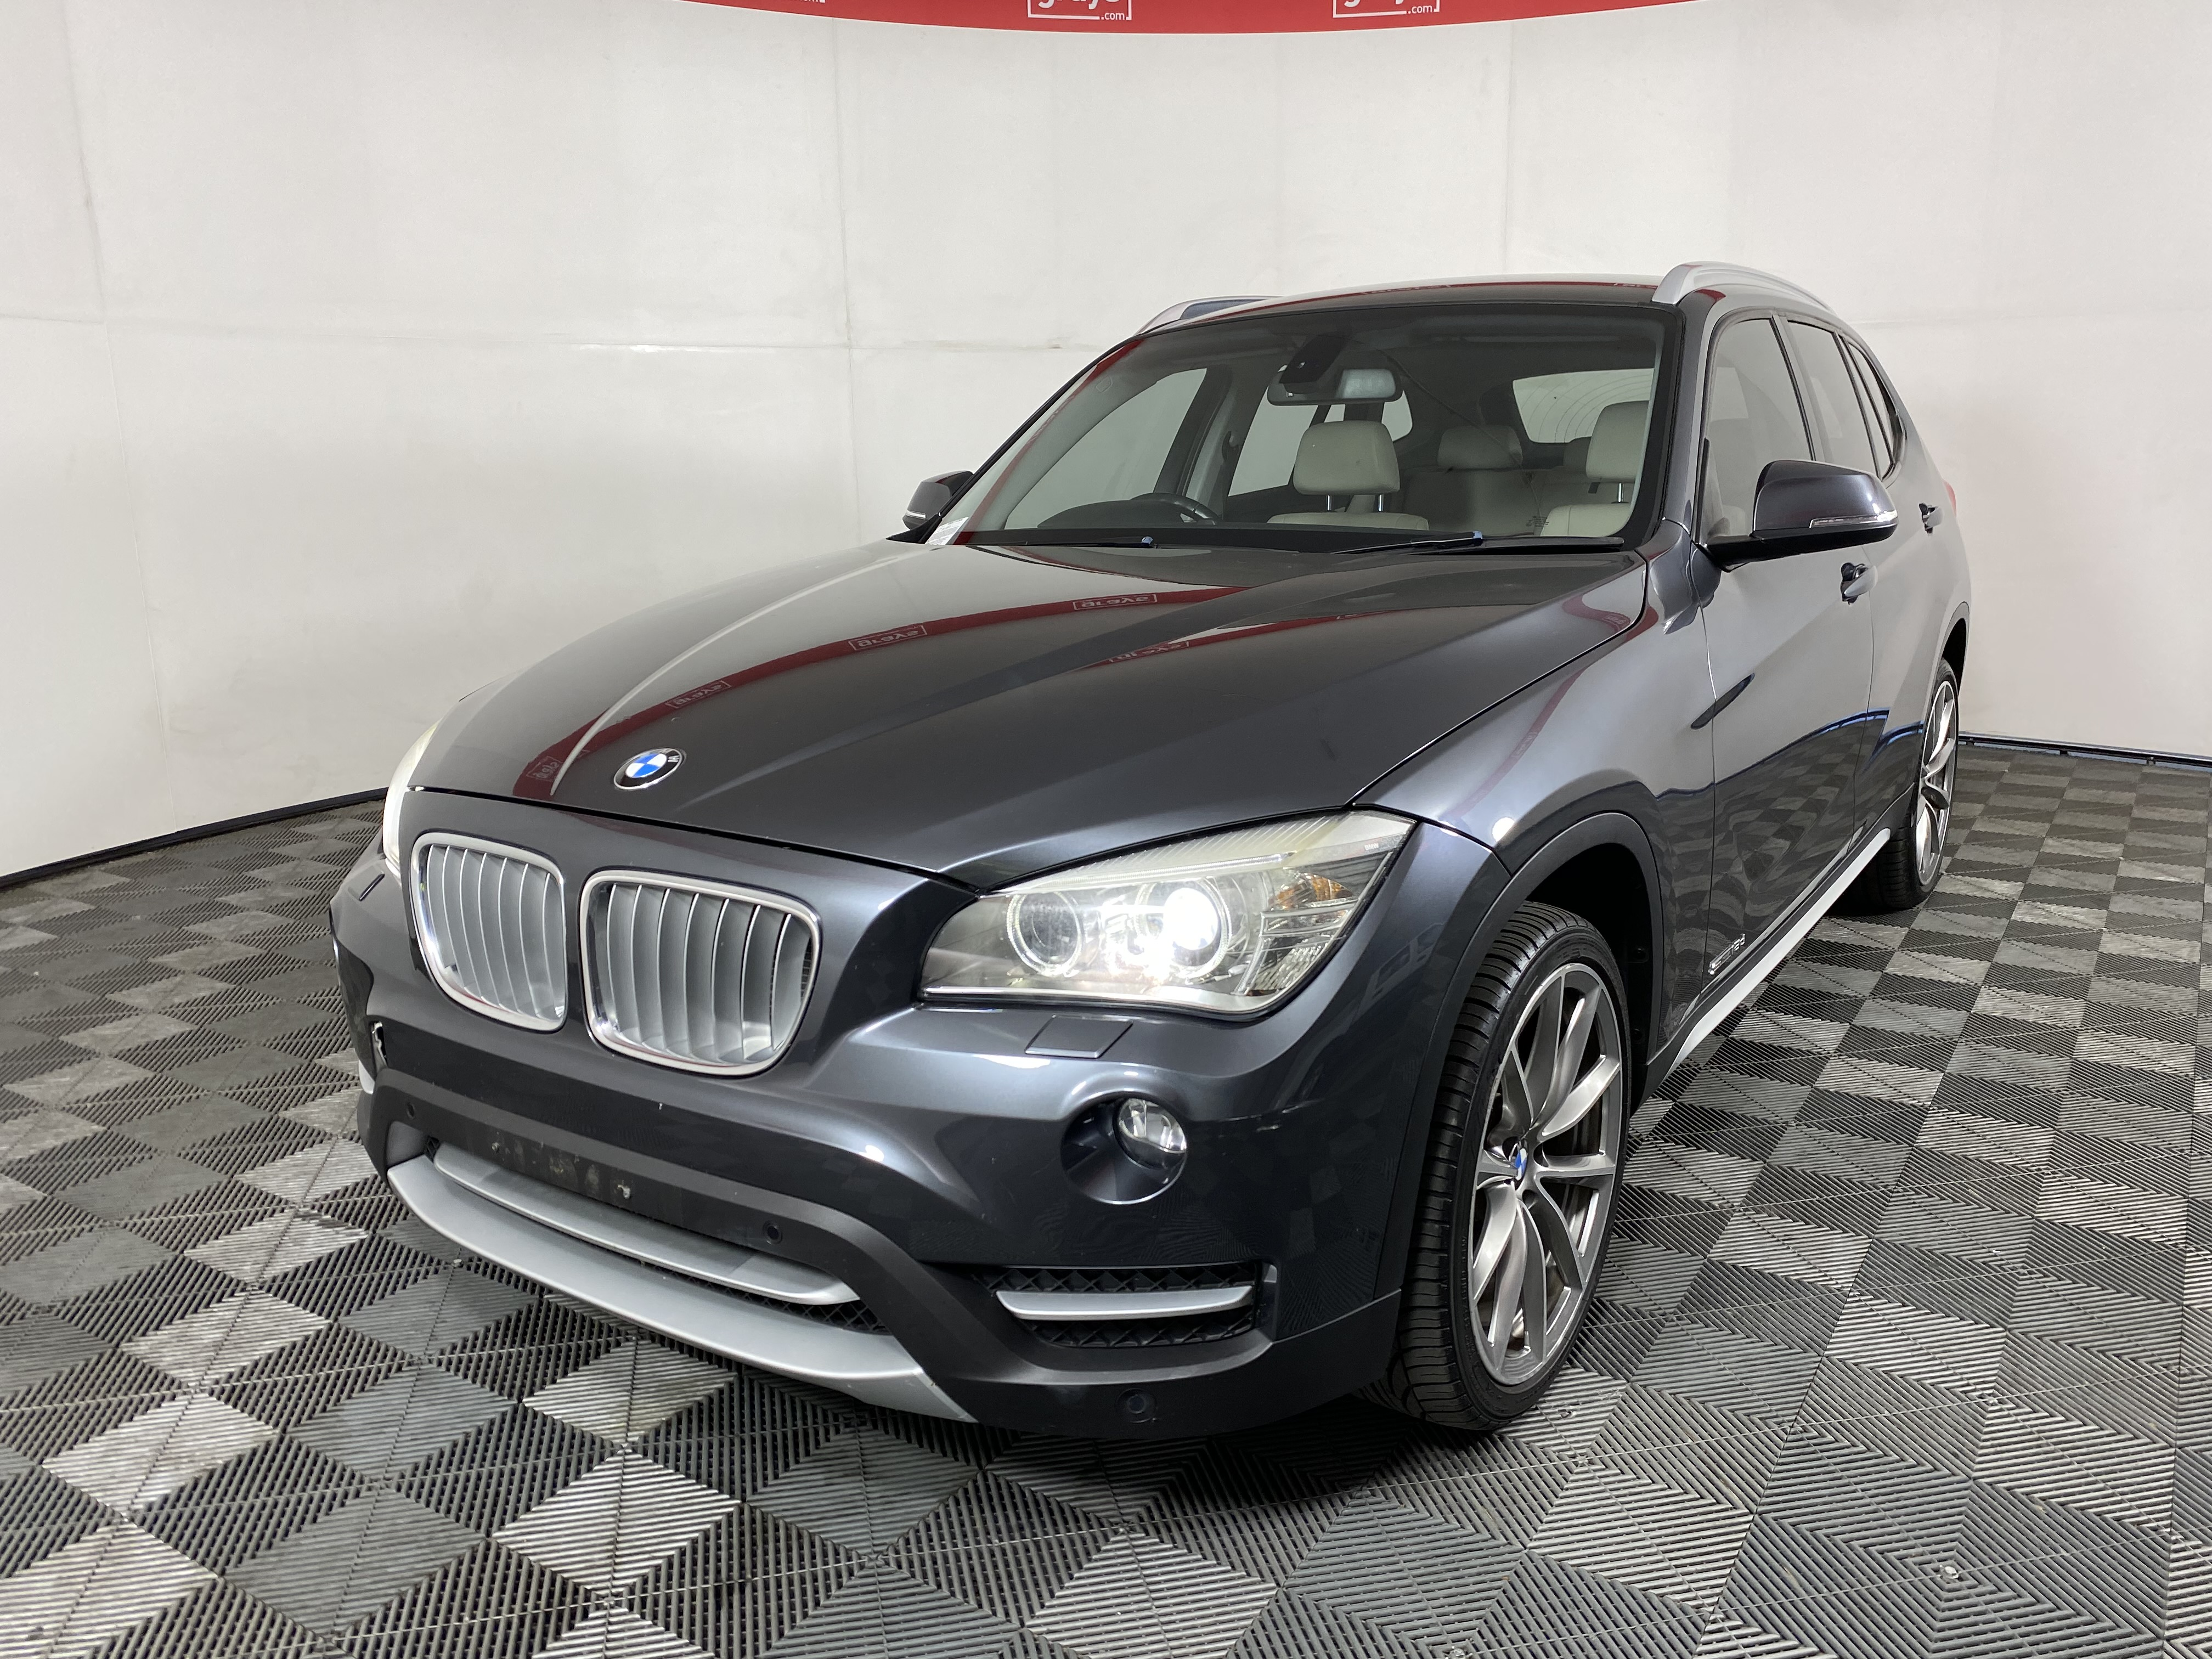 2014 BMW X1 sDrive 18d E84 LCI Turbo Diesel Auto Wagon 97,203km